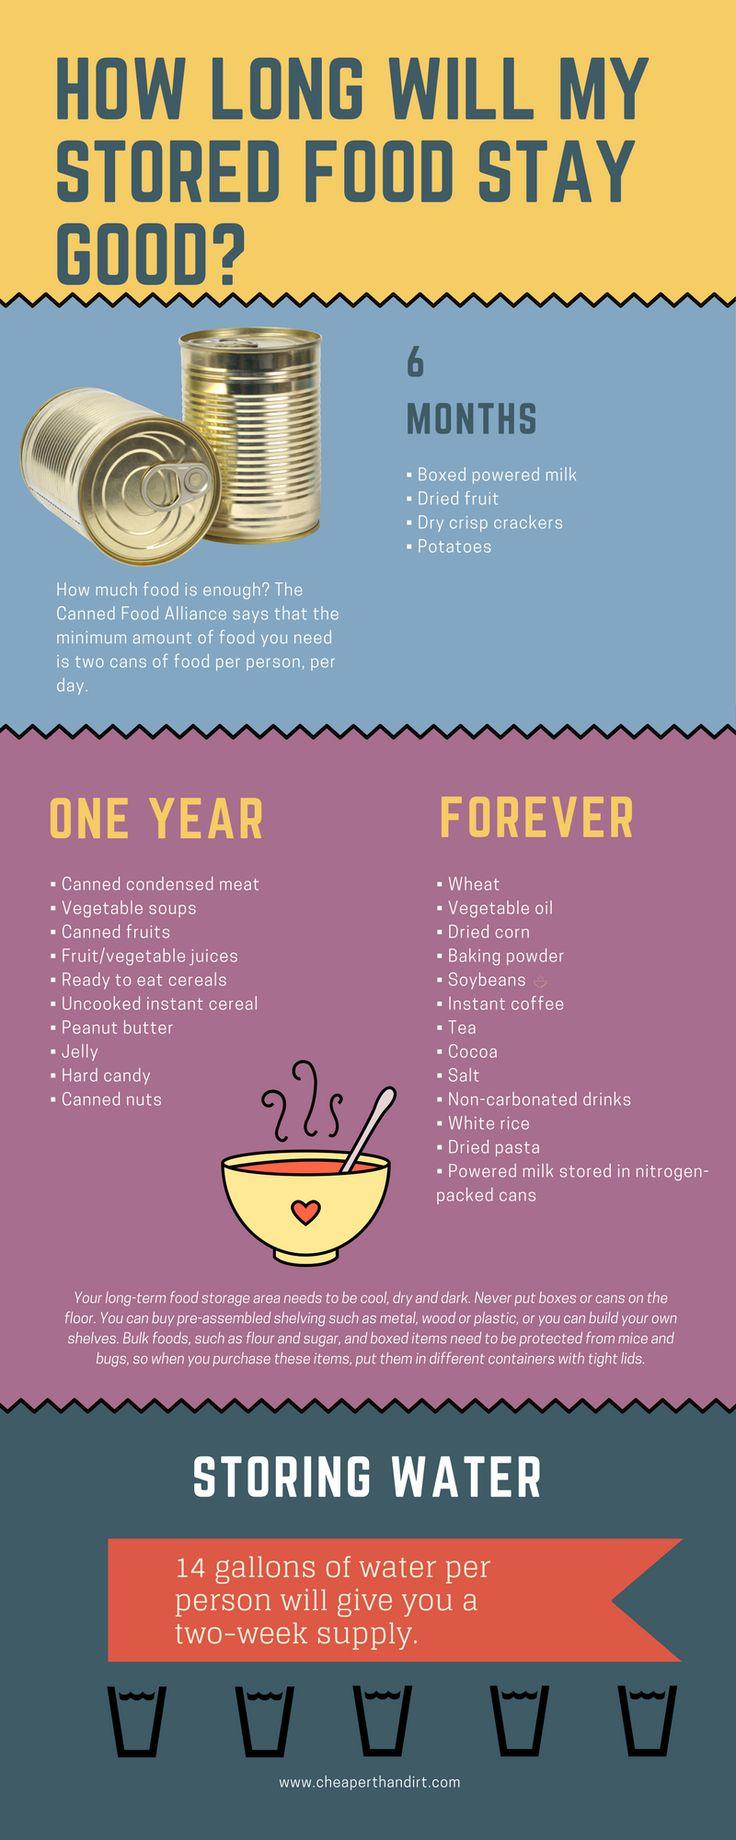 best cooking tipsinformation images on pinterest tips food